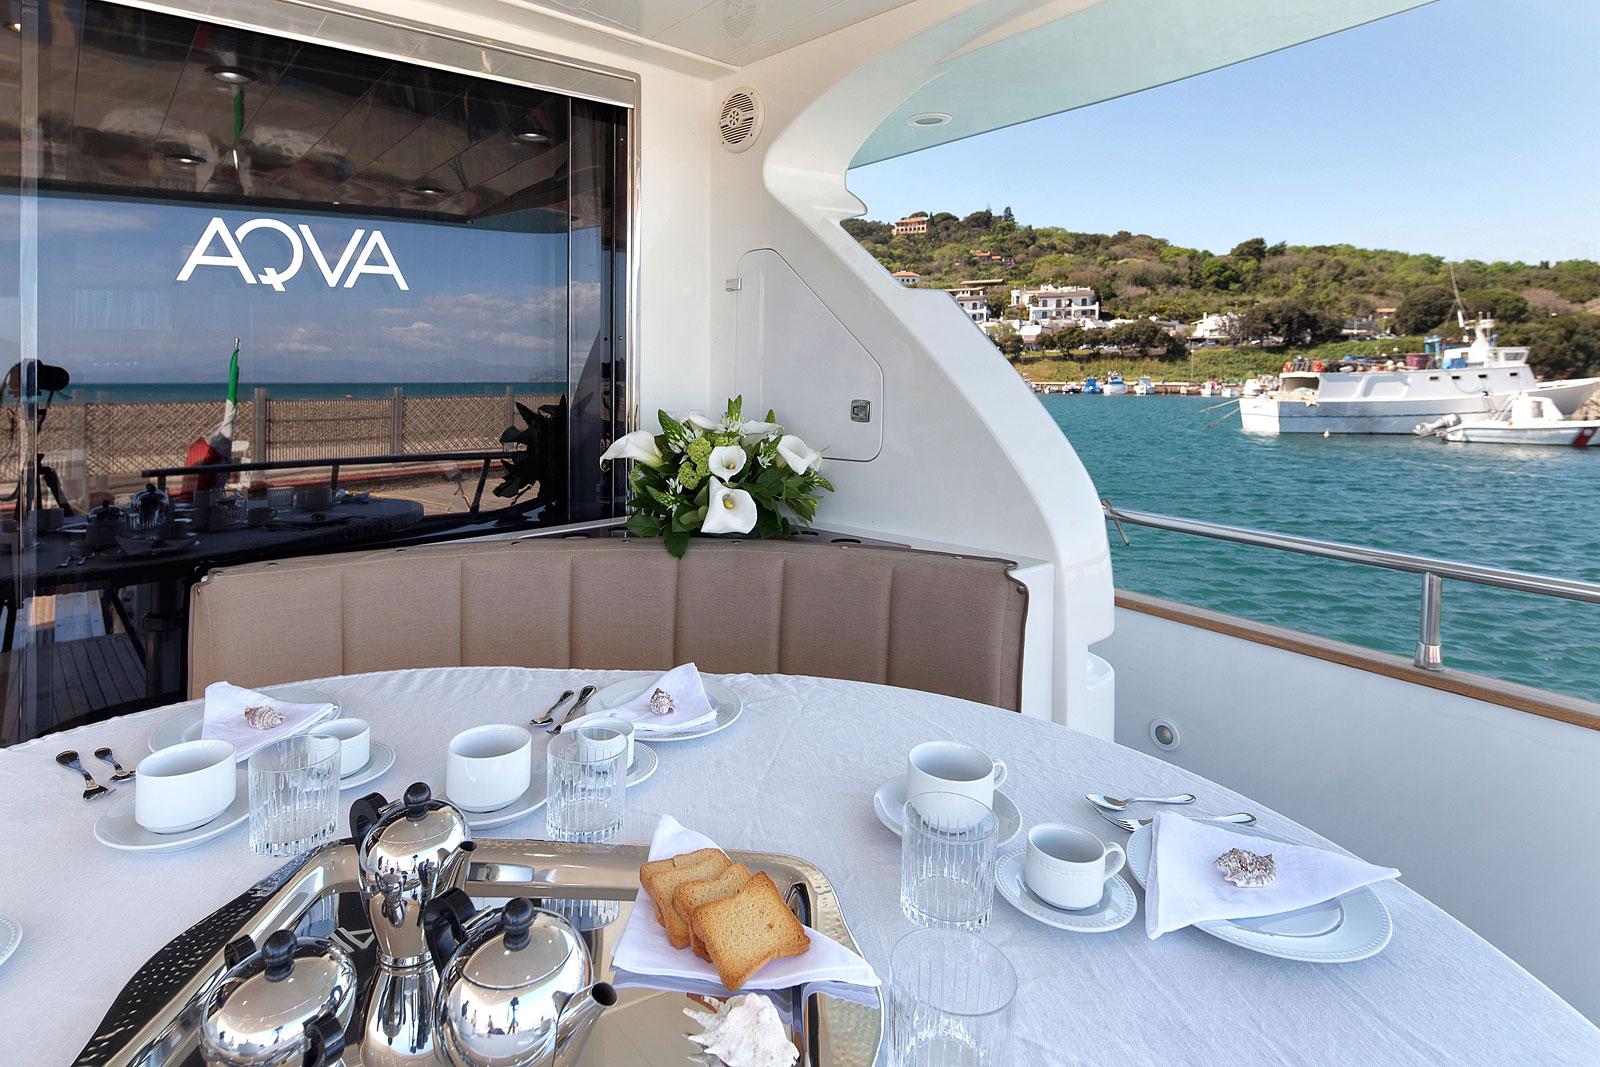 Motor Yacht AQVA - Alfresco dining aft deck